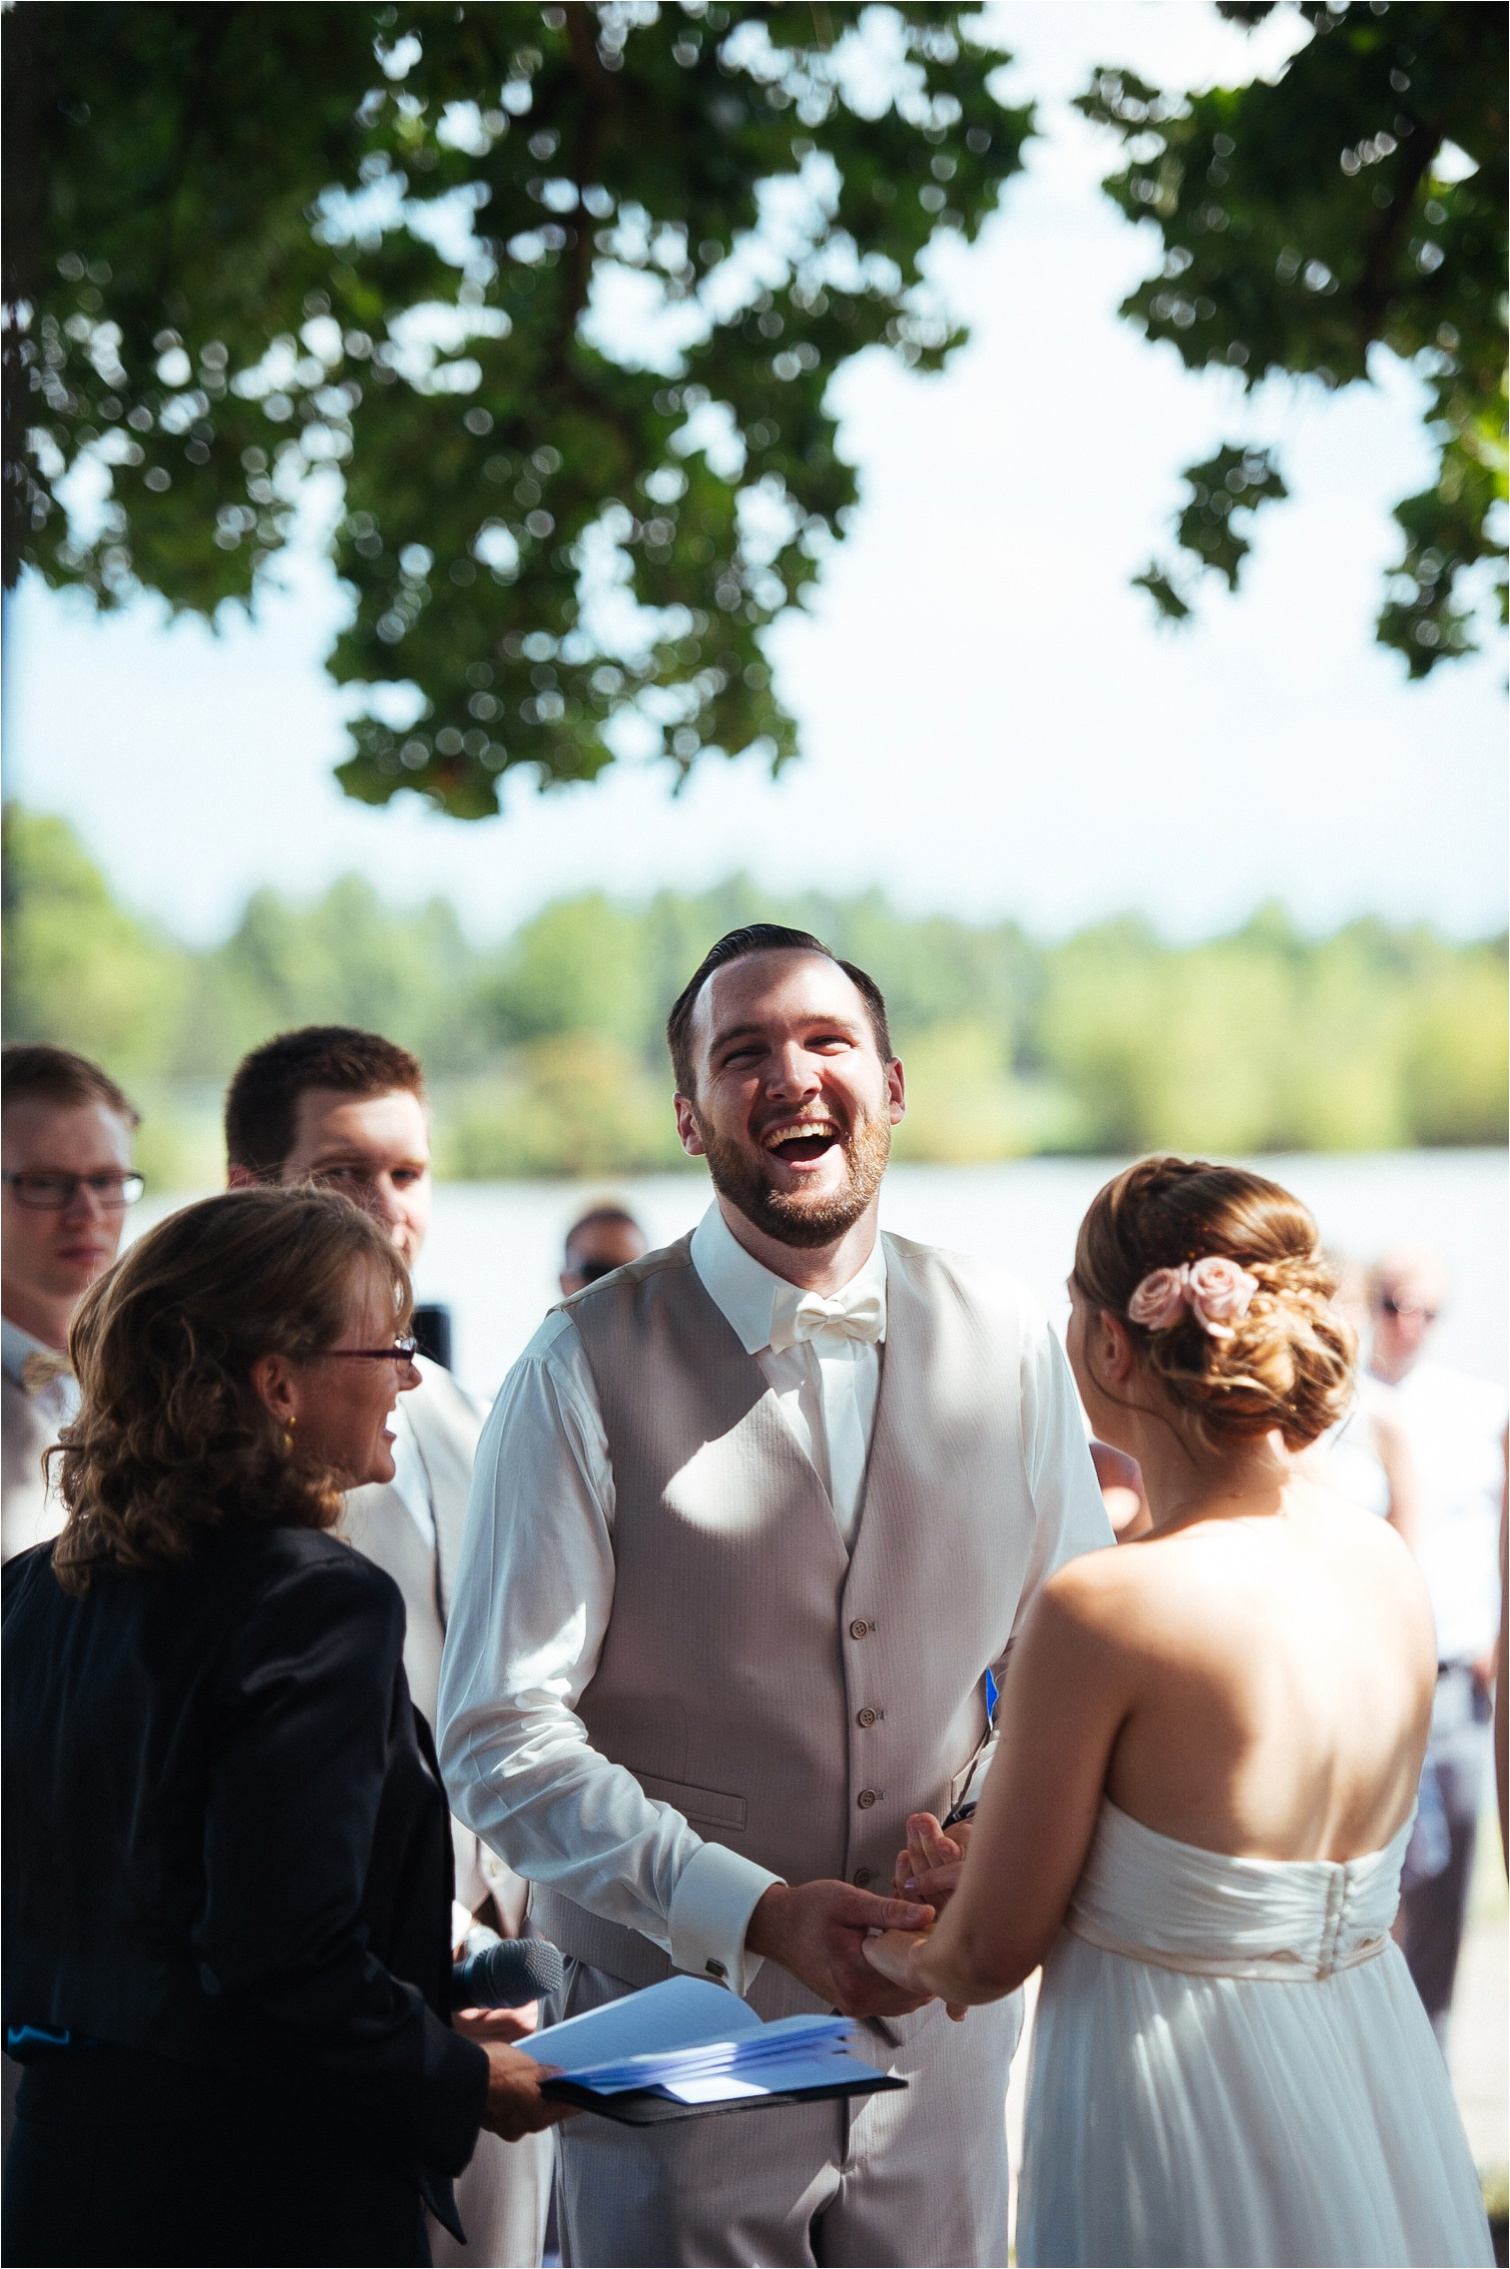 Jenny&Mitch_Sebel_Windsor_Sydney_Polo_Club_wedding-by_The_Follans_Gold_Coast_Wedding_Photographers_0053.jpg